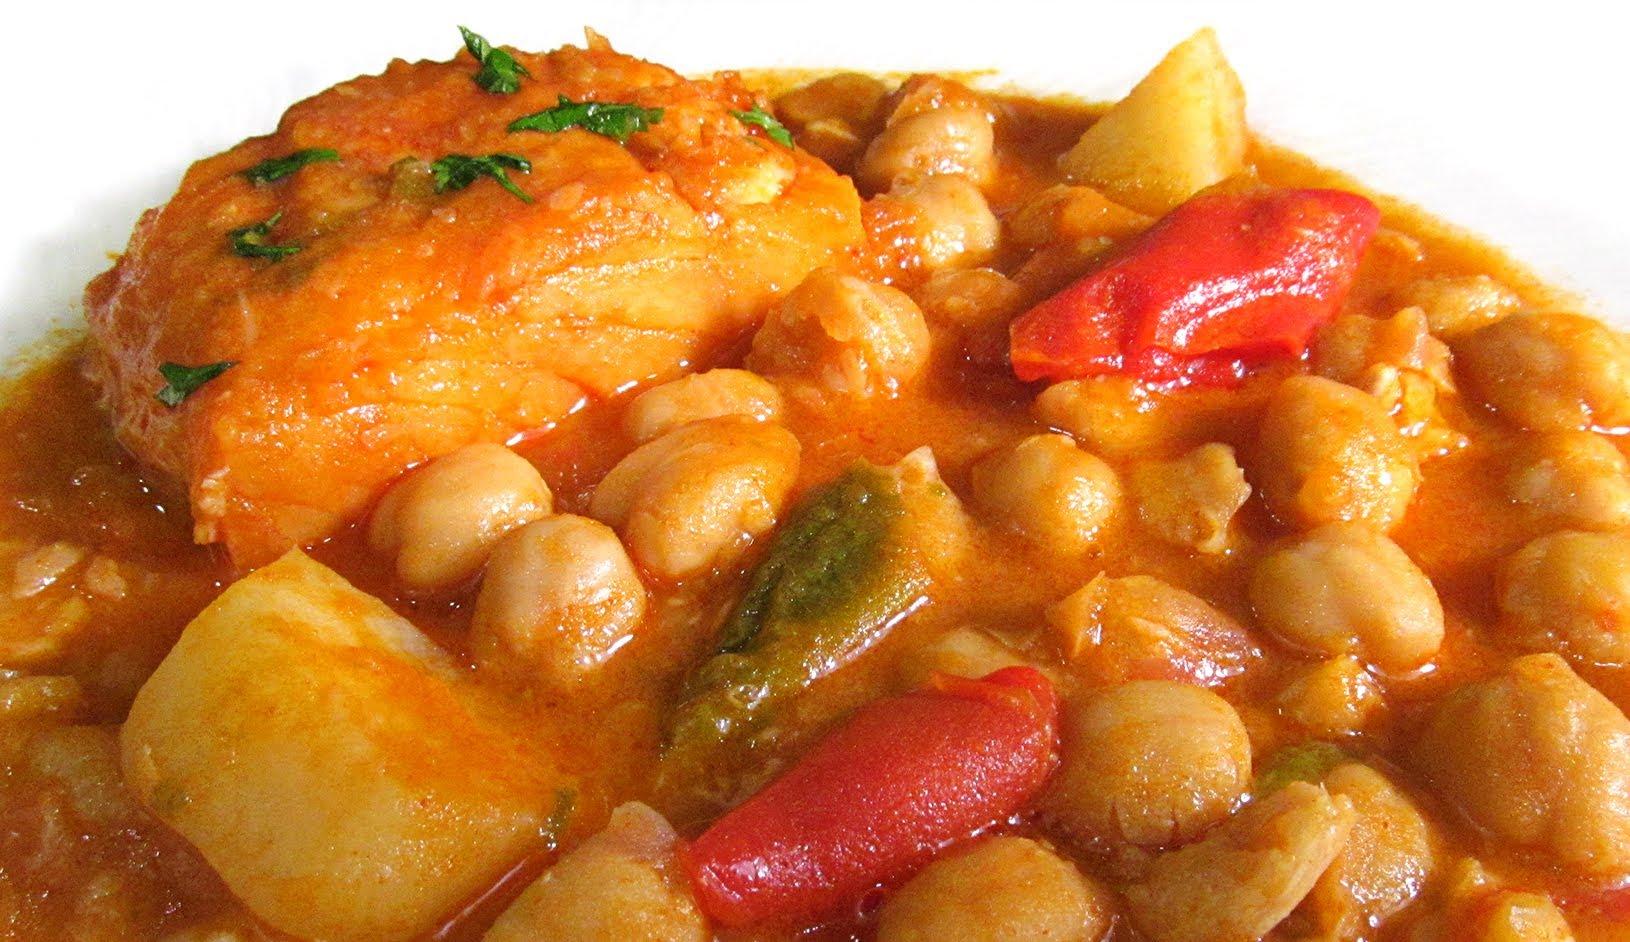 Savour delicious easter food in malaga malaga blog - Bacalao con garbanzos y patatas ...